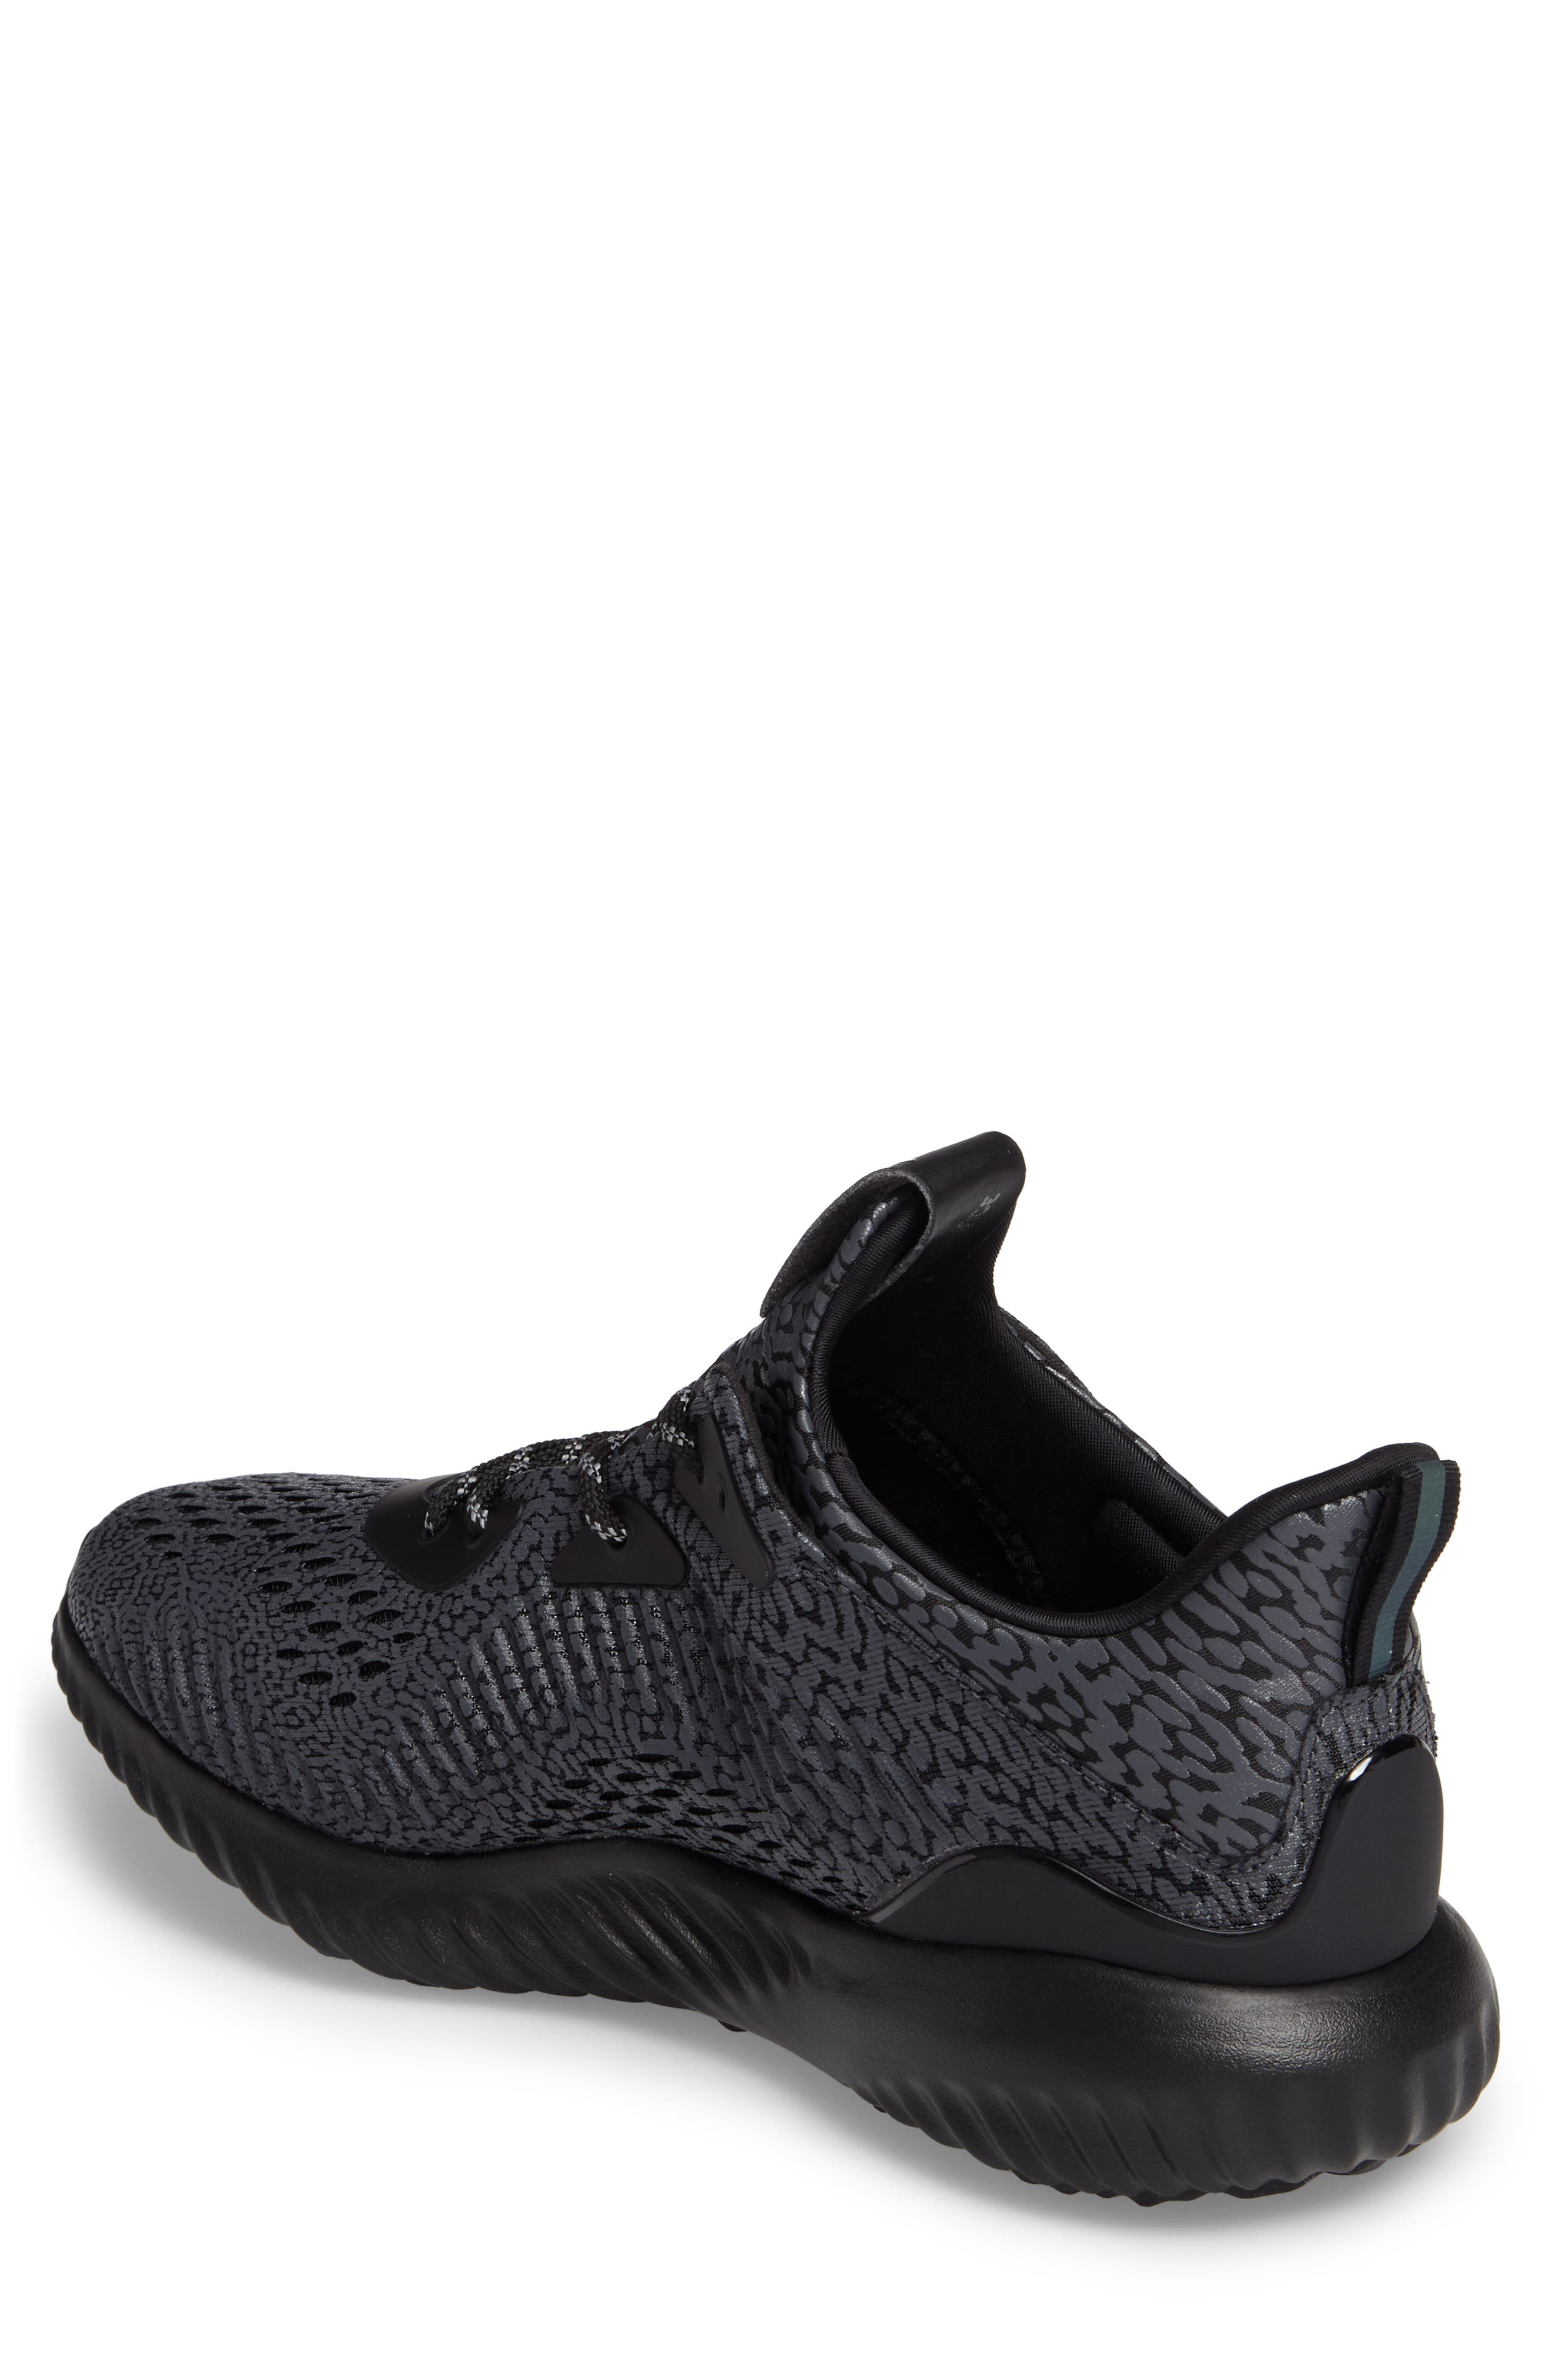 AlphaBounce Aramis Sneaker,                             Alternate thumbnail 2, color,                             001